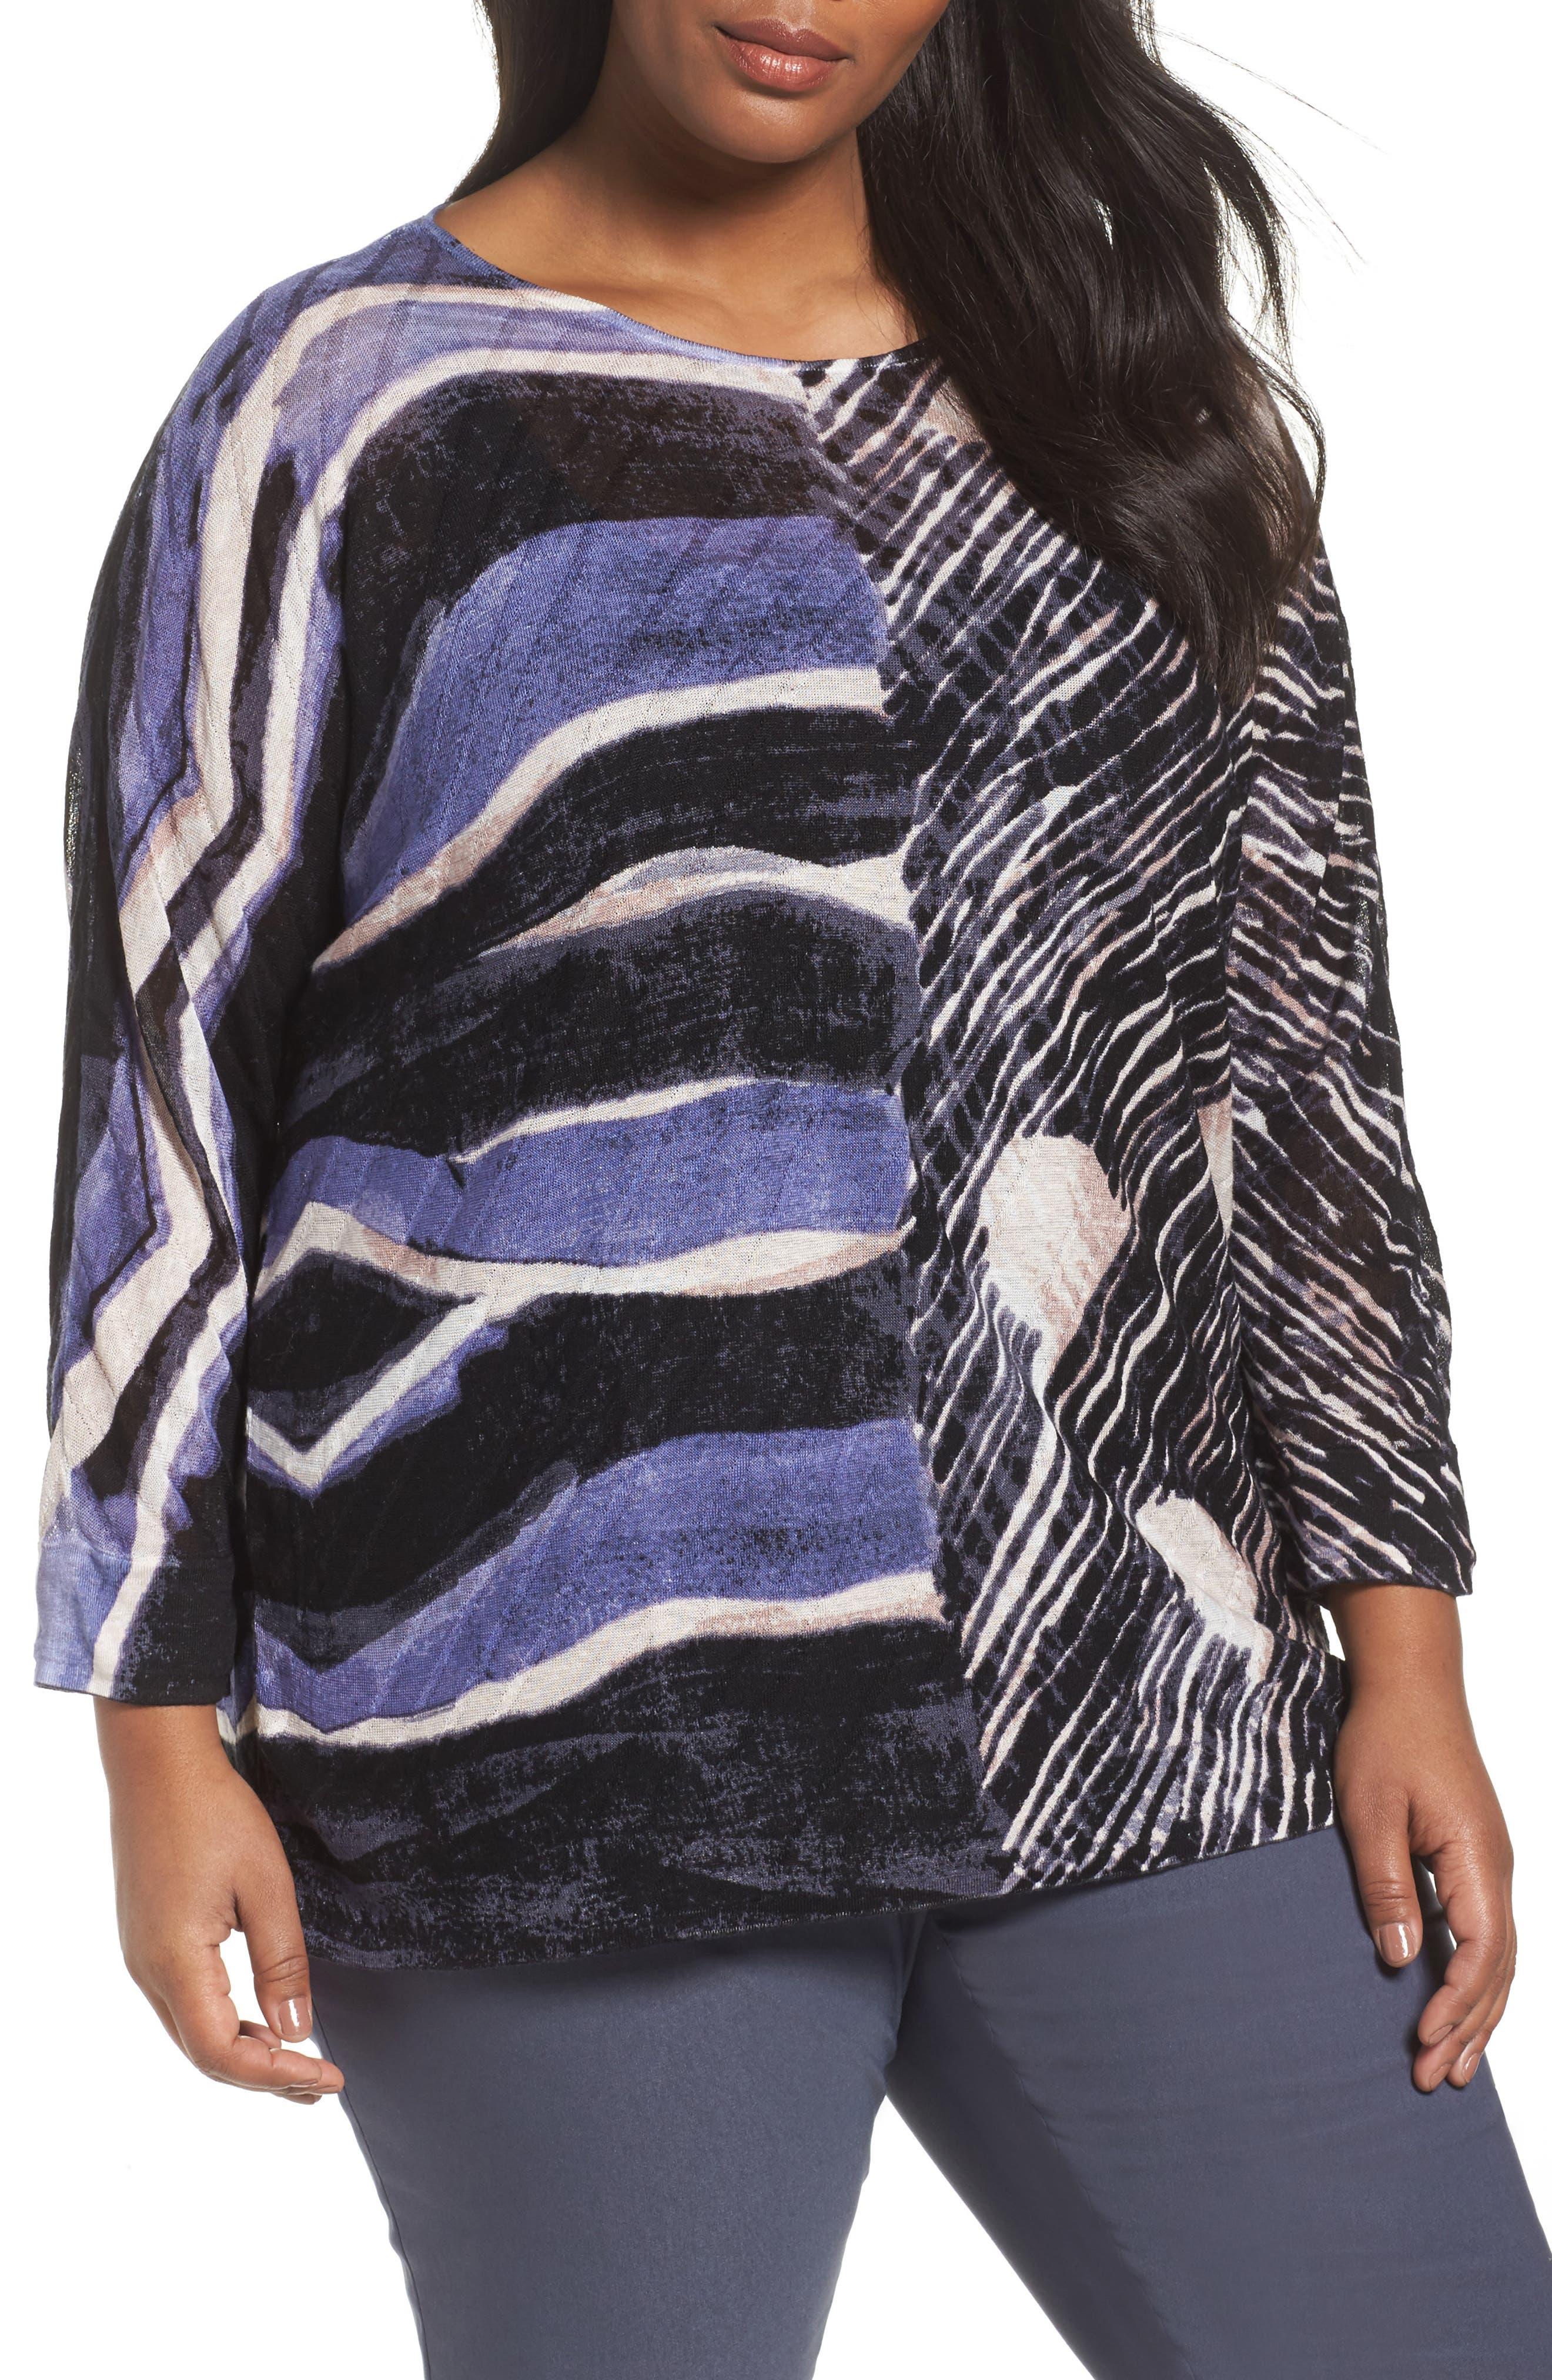 Sierra Sweater,                             Main thumbnail 1, color,                             Blue Multi